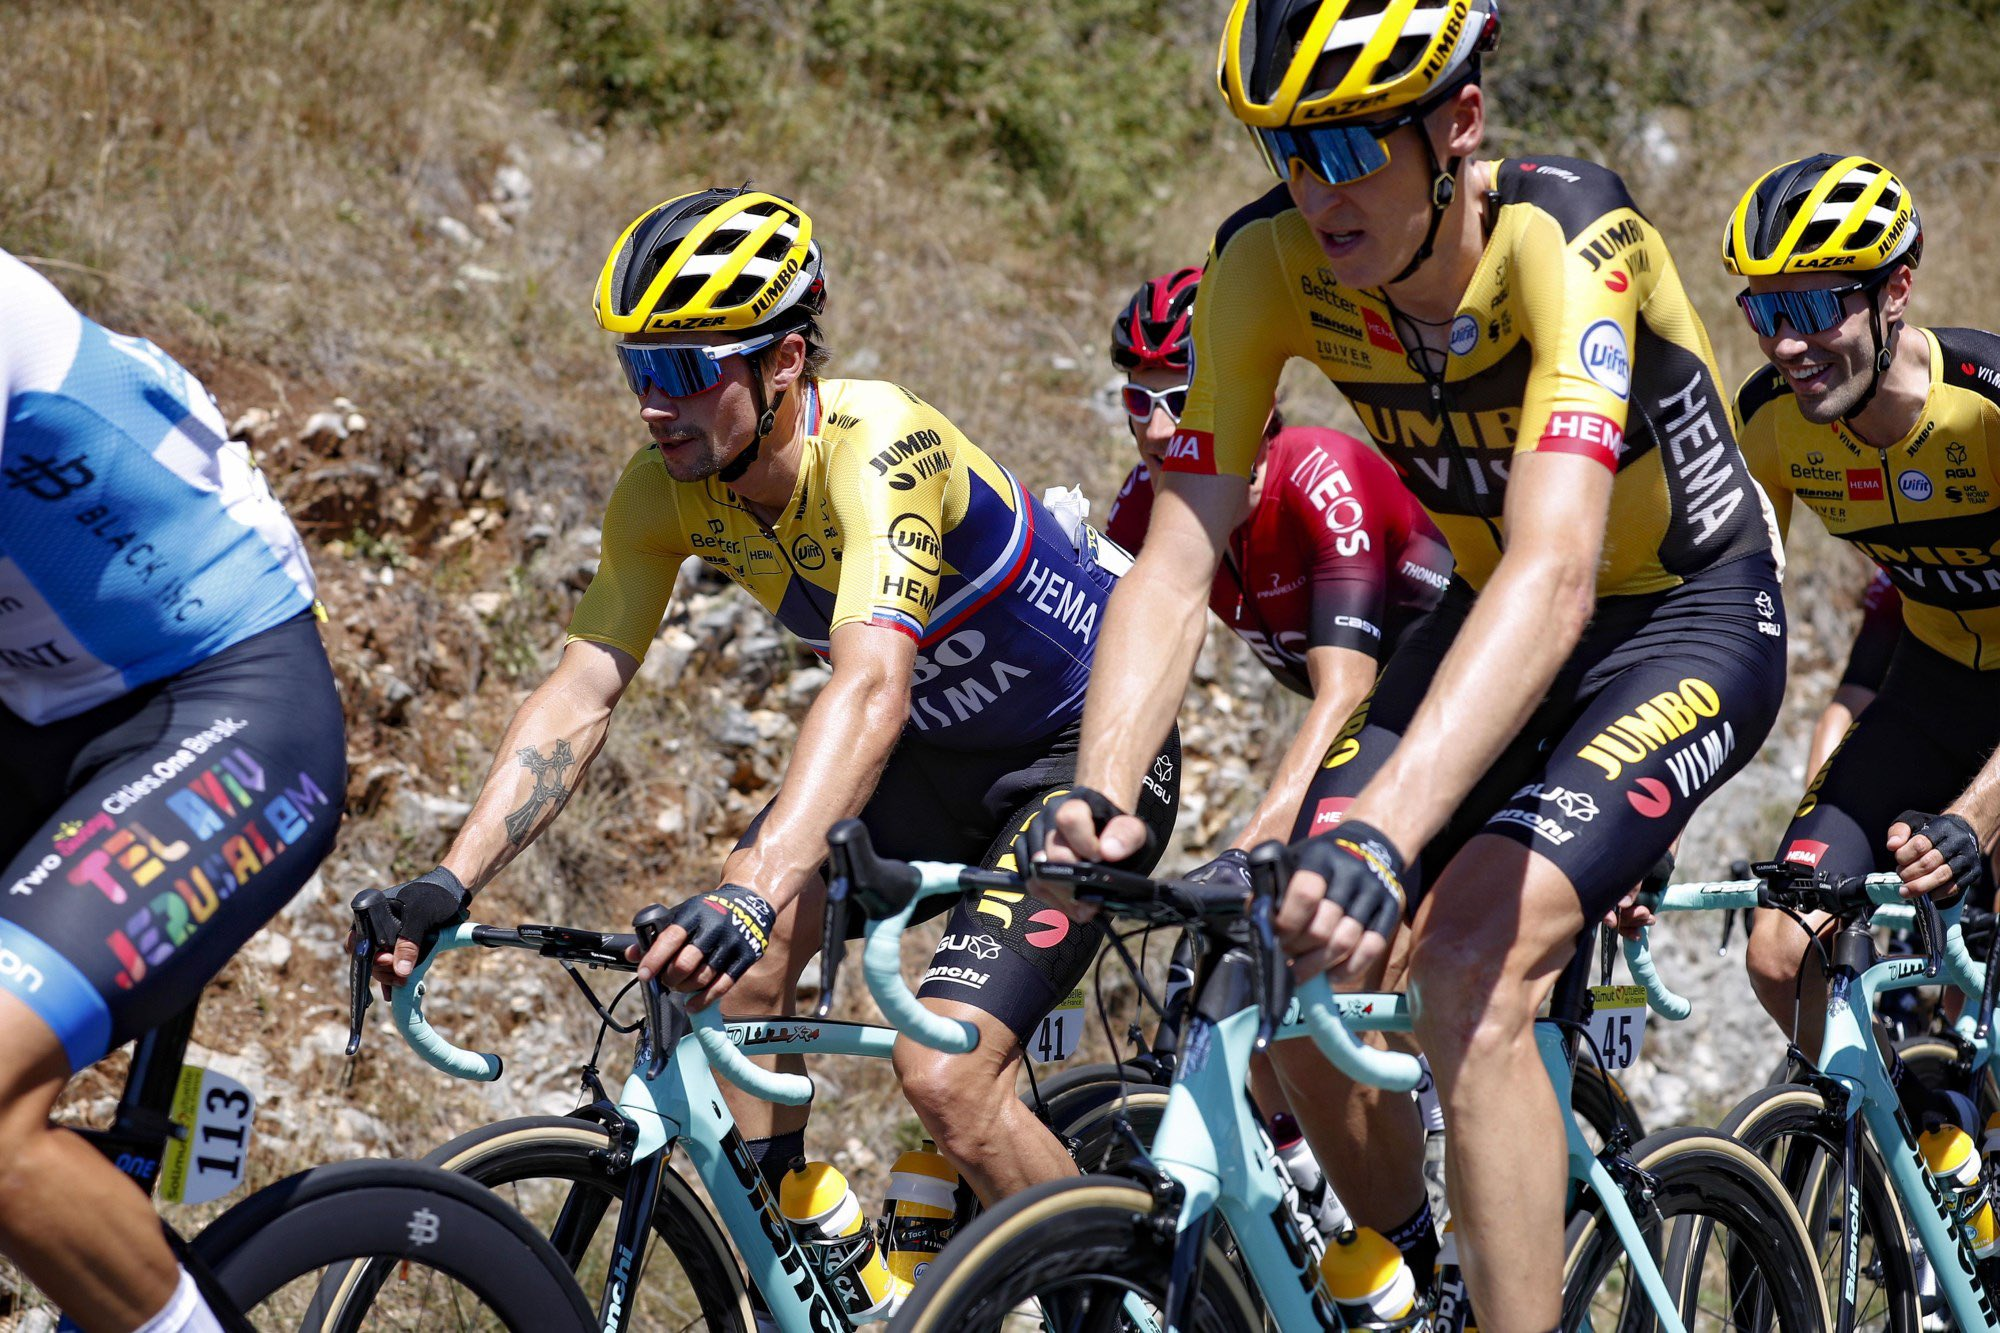 Jumbo Visma Team Ineos etapa 1 Tour l'Ain 2020- ph. Jumbo Visma - www.ciclismocolombiano.com